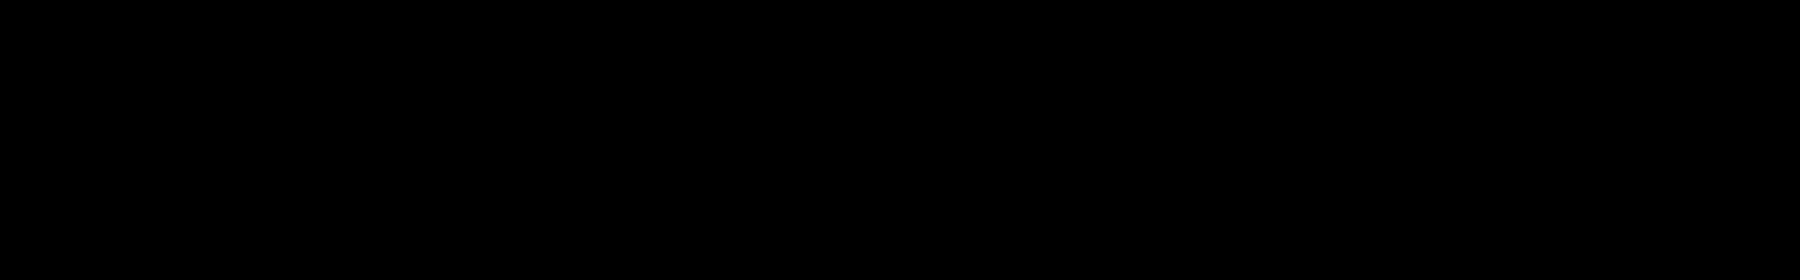 DIVE - Midi Chord Progressions audio waveform